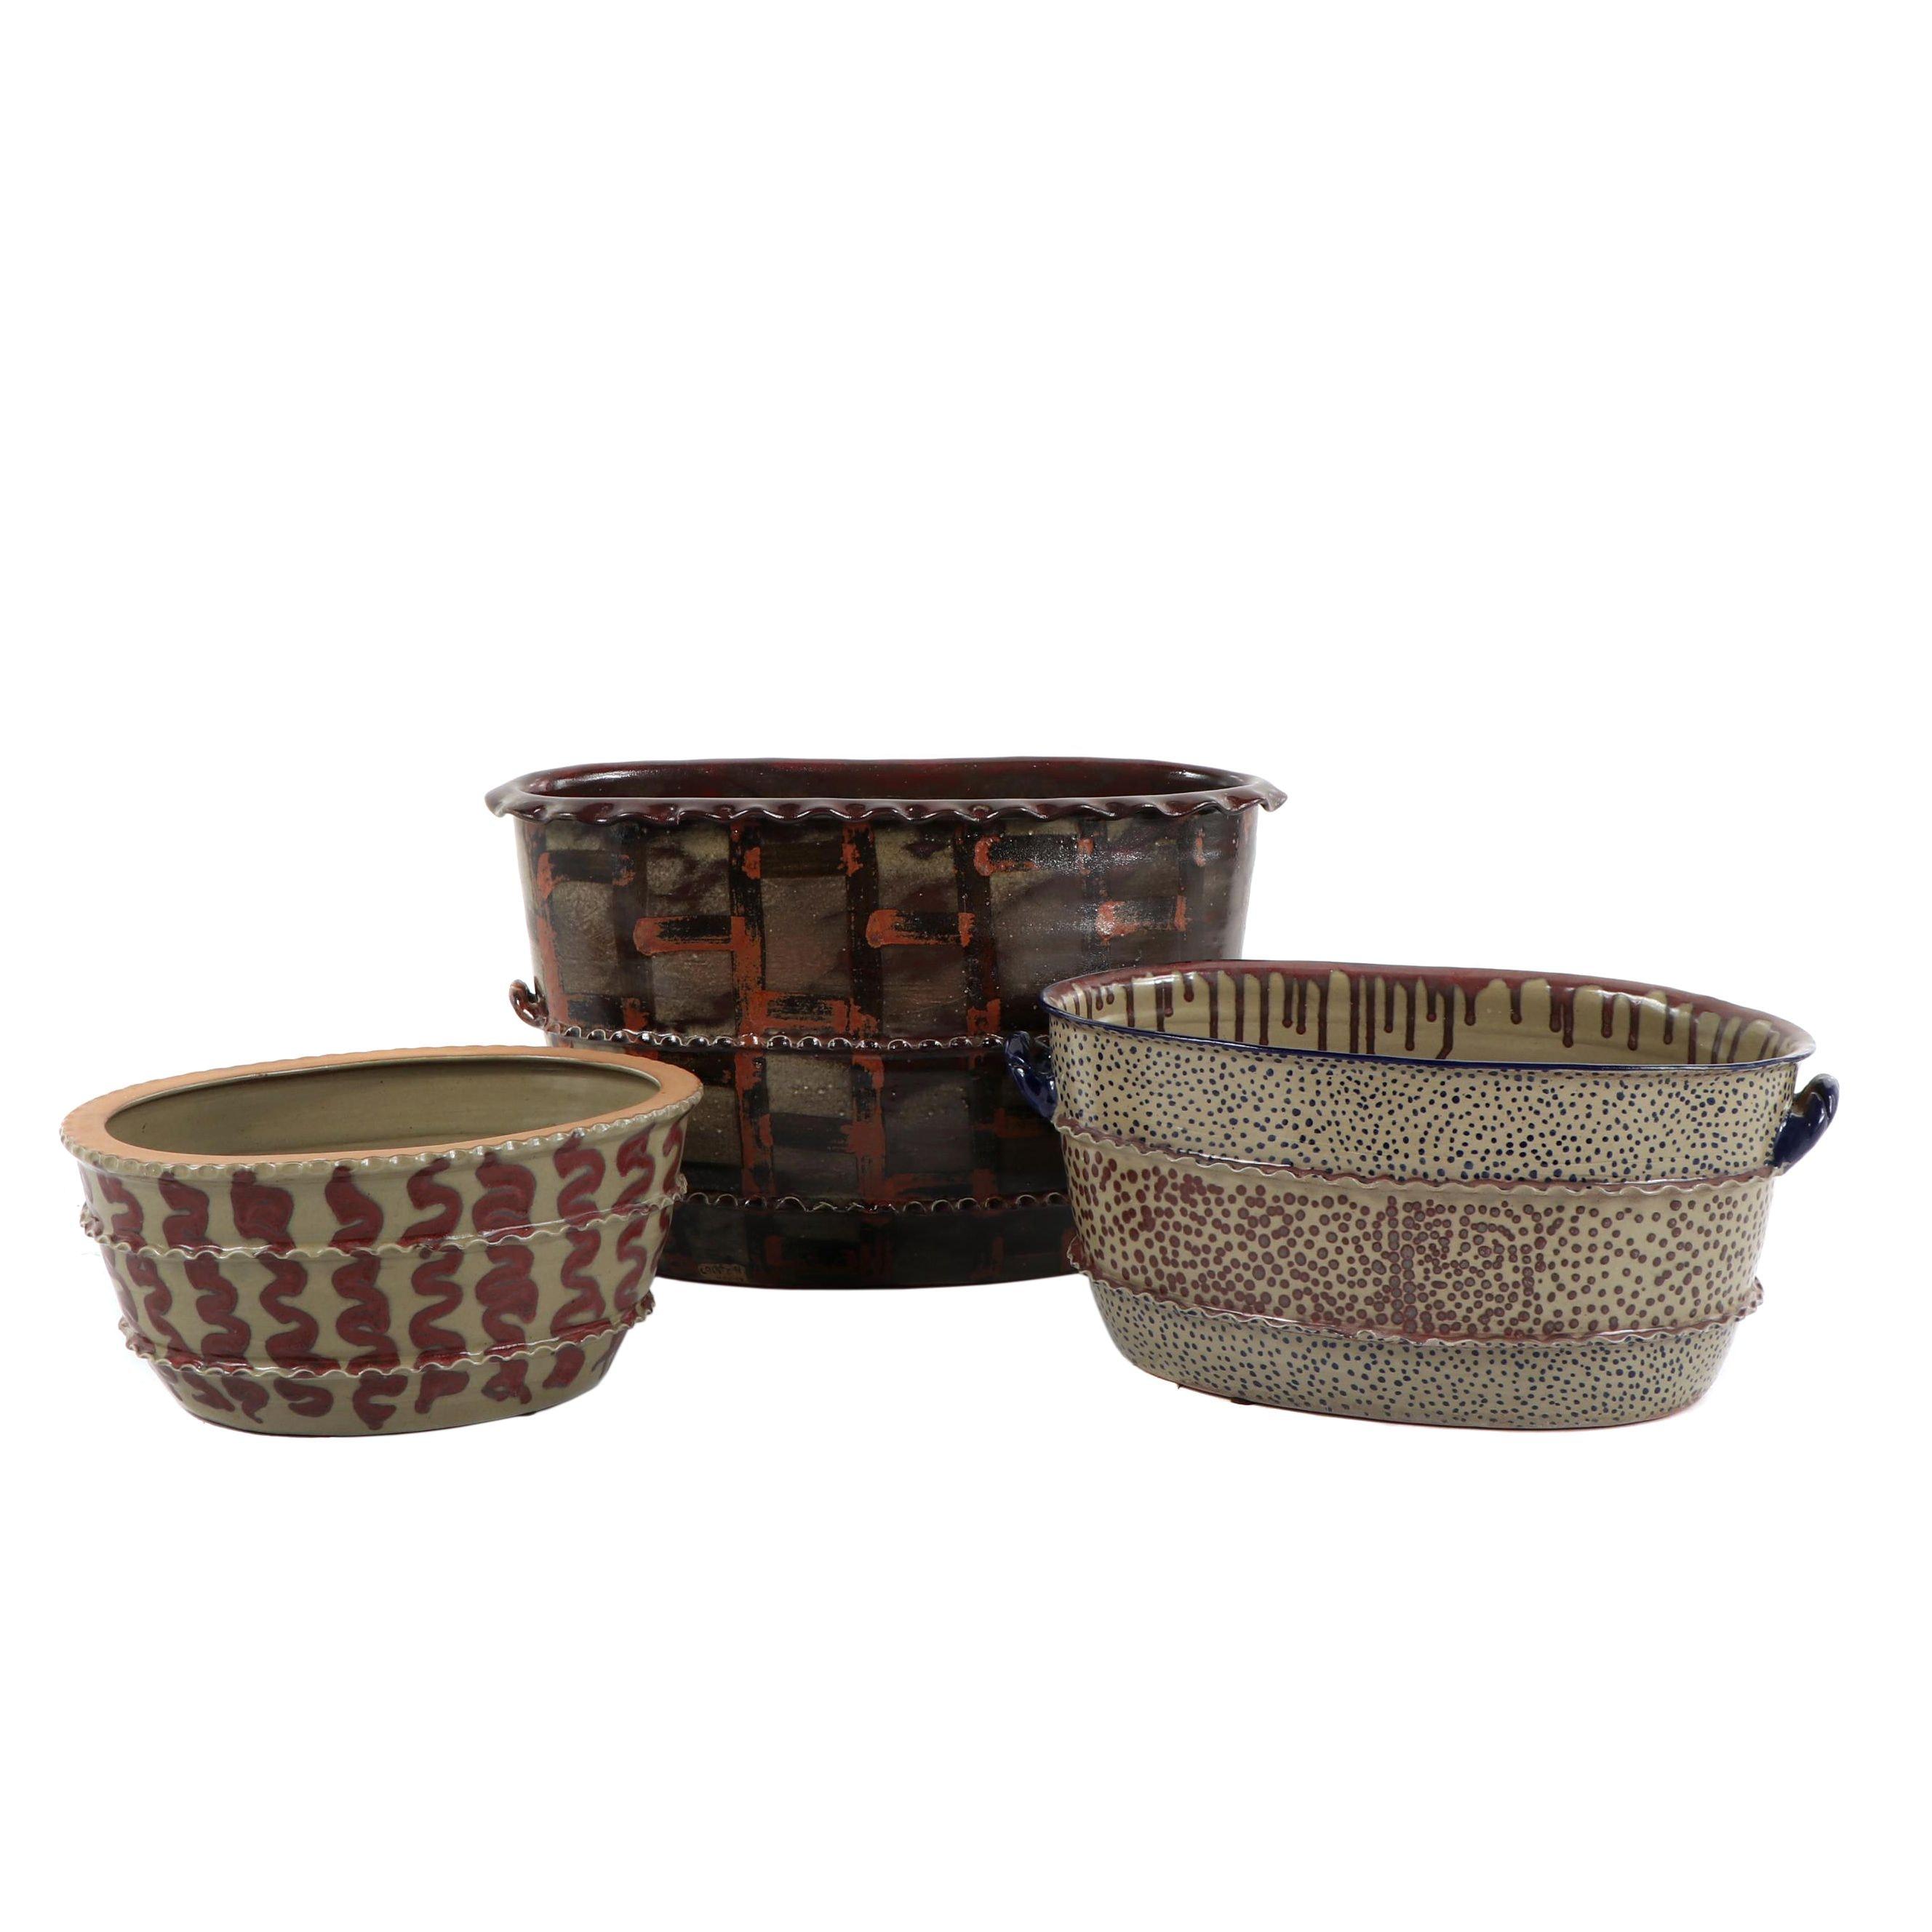 Handmade Oval Earthenware Planters